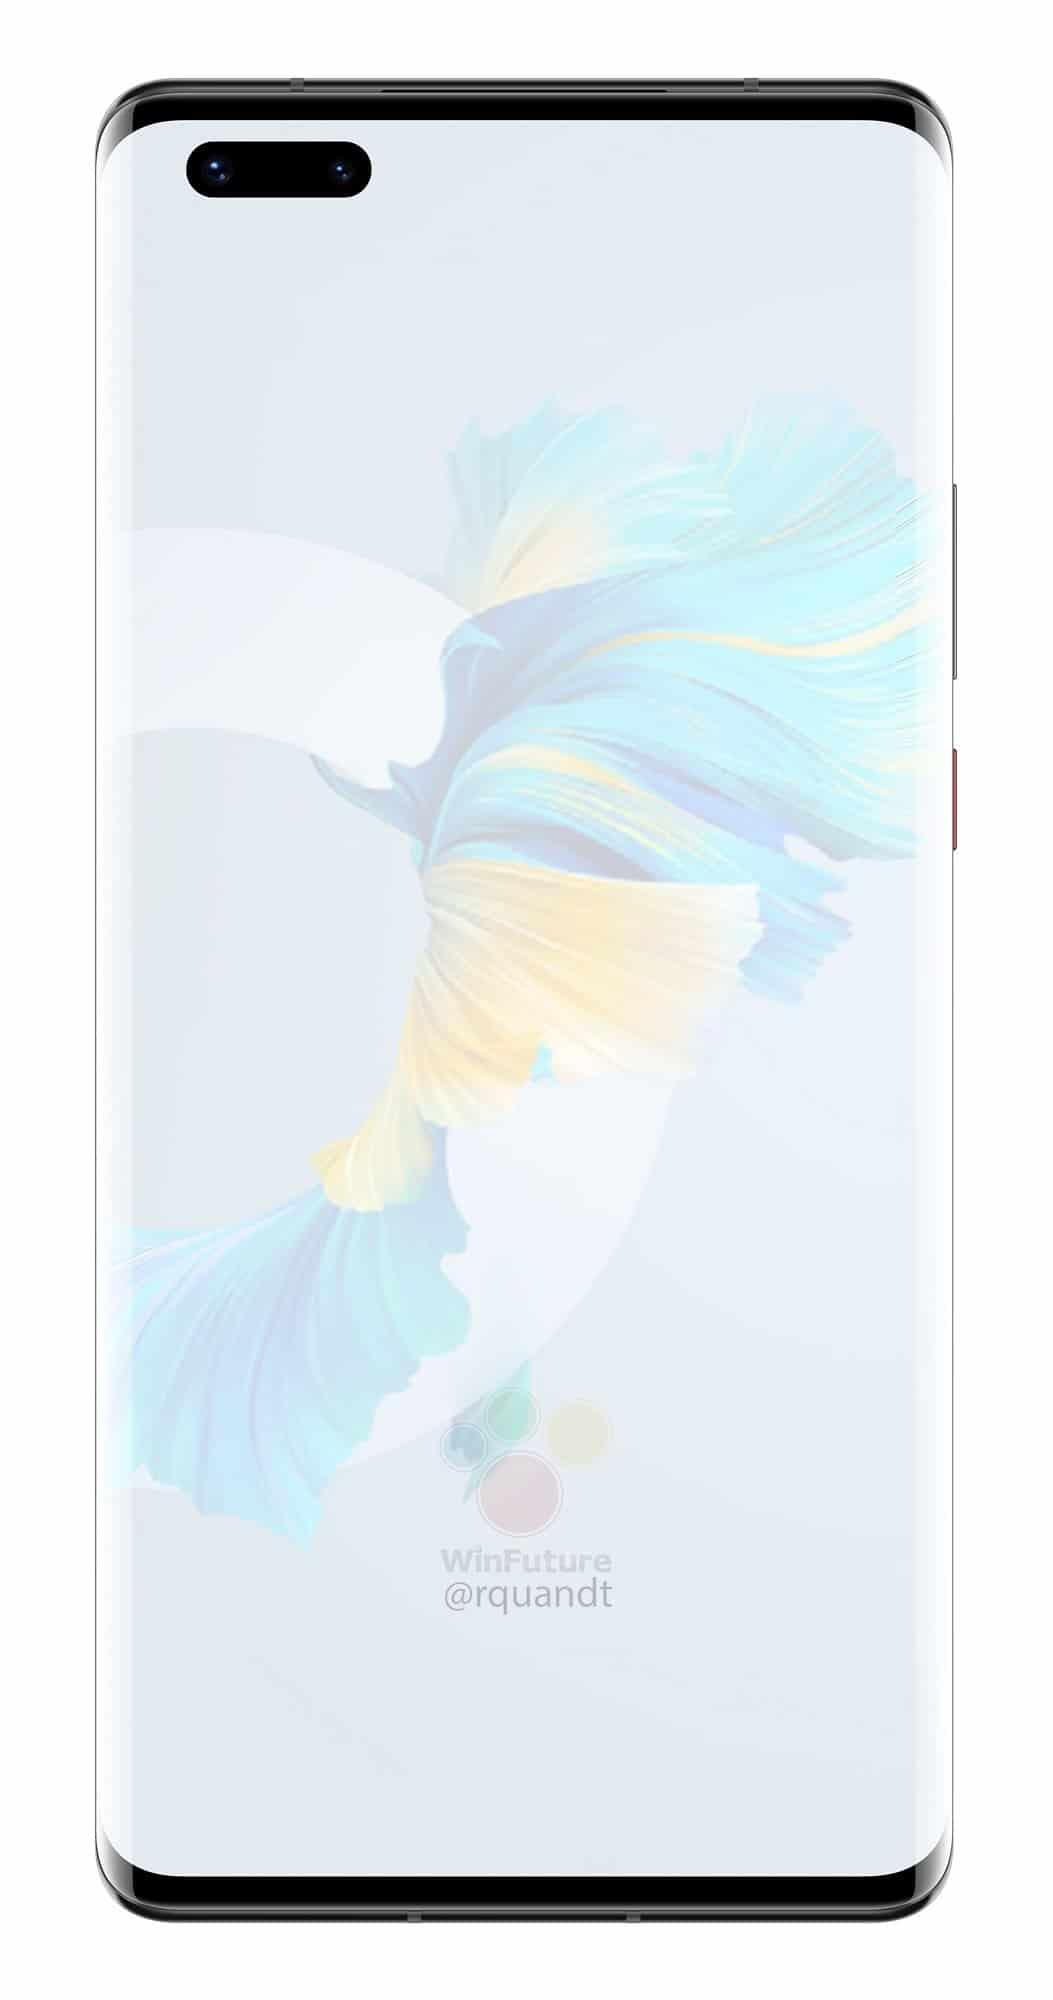 Huawei Mate 40 Pro leak 8